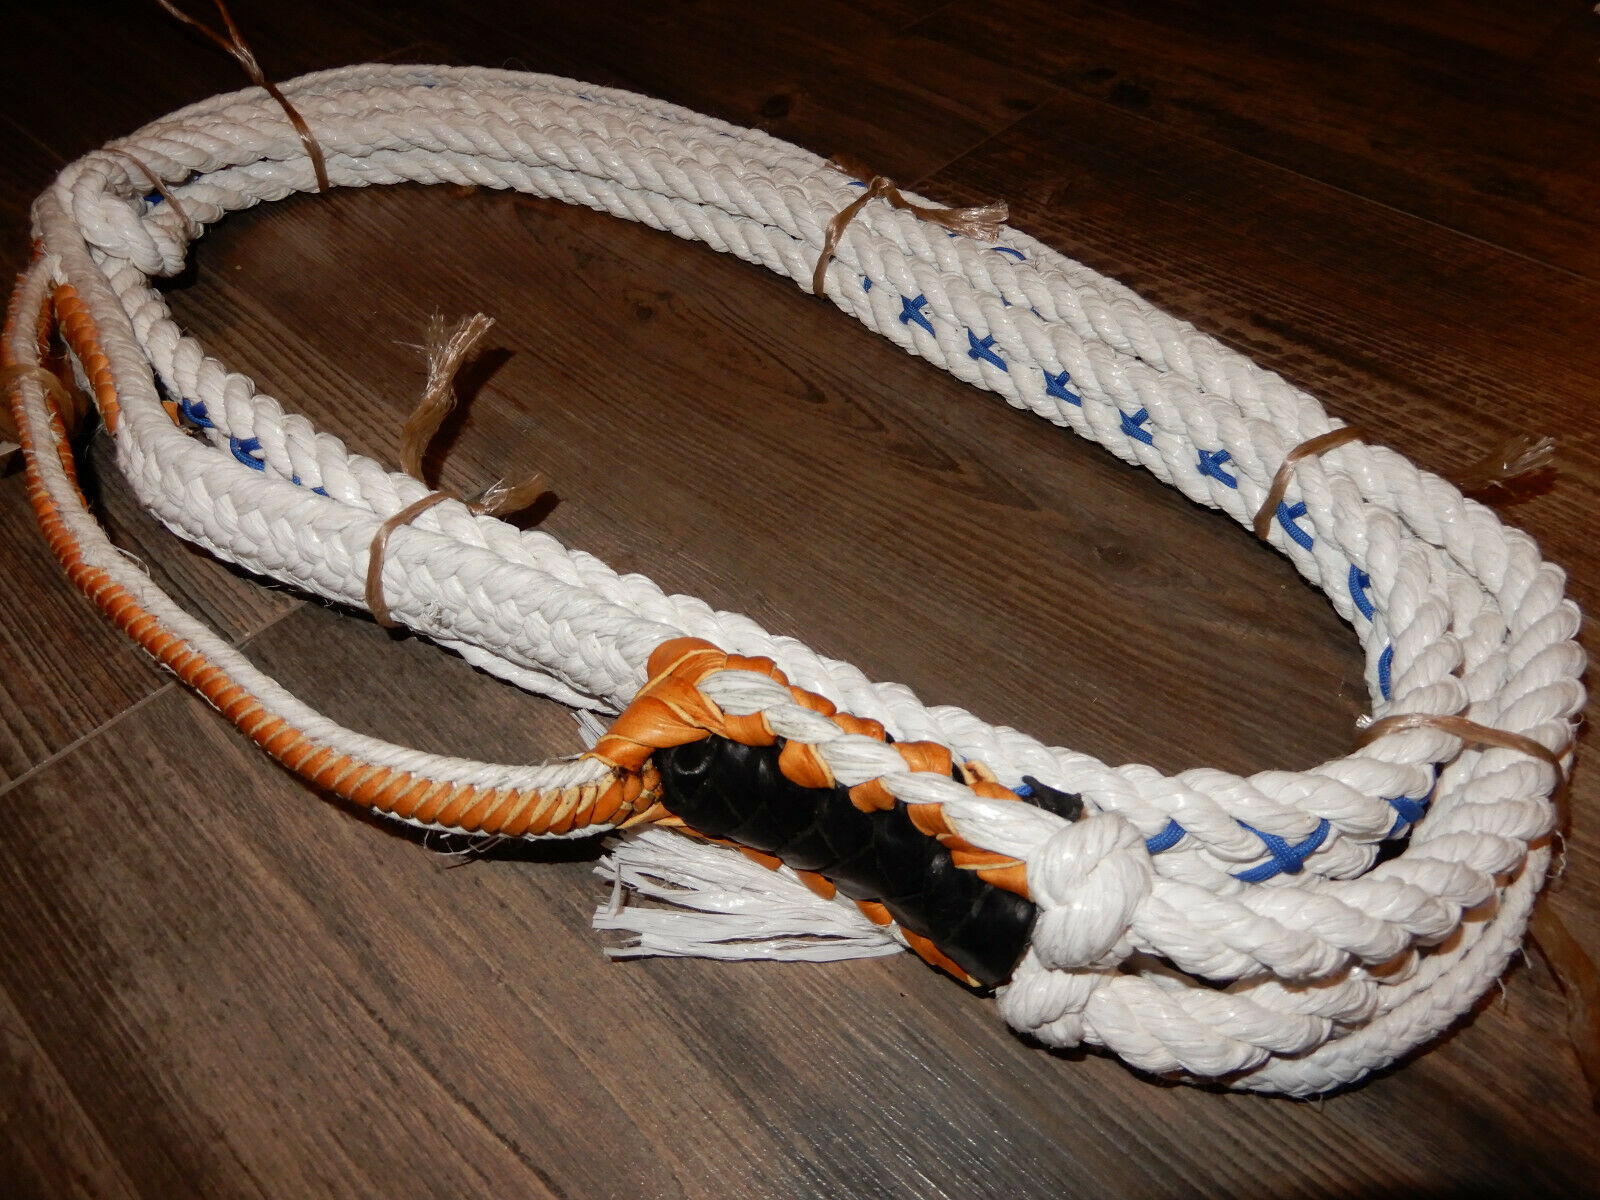 Bull Cuerda Poly blancoo Personalizado Pro 9 7 Derecho Mano Cocodrilo Bull a caballo Toro Rider